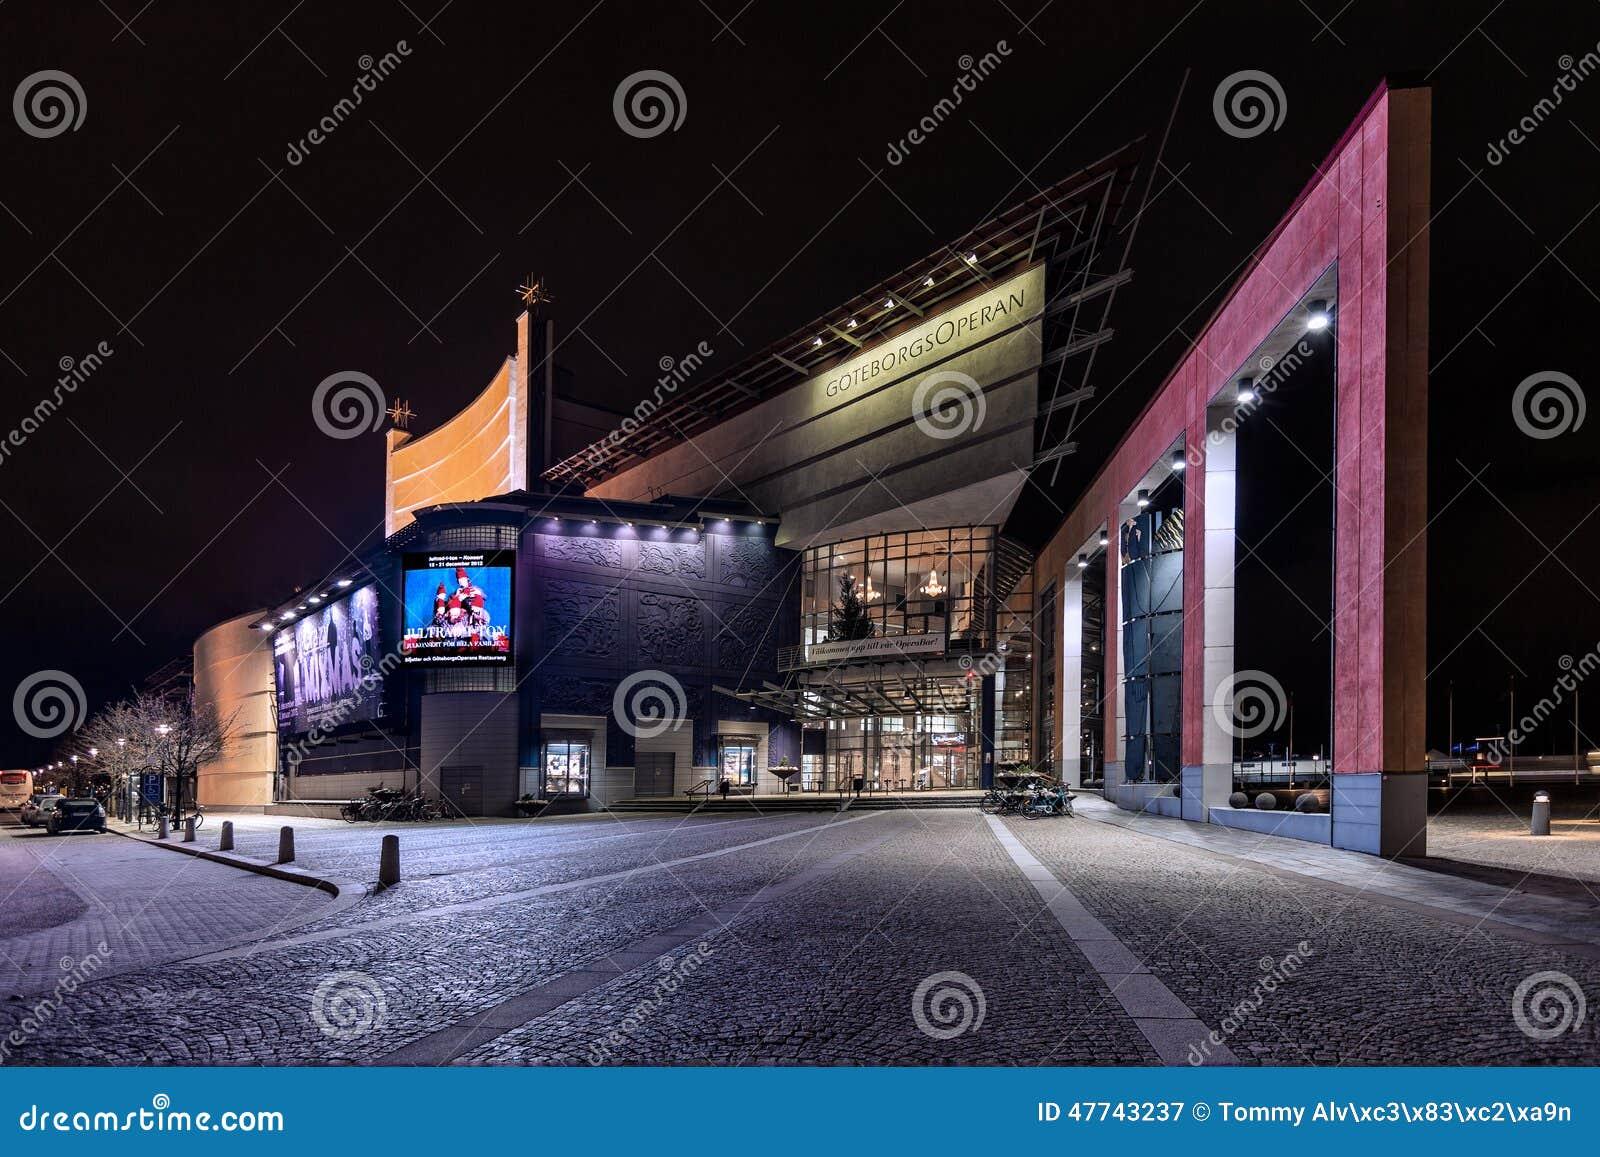 Belysning Göteborg : Göteborg operahus under aftonbelysningen redaktionell arkivbild